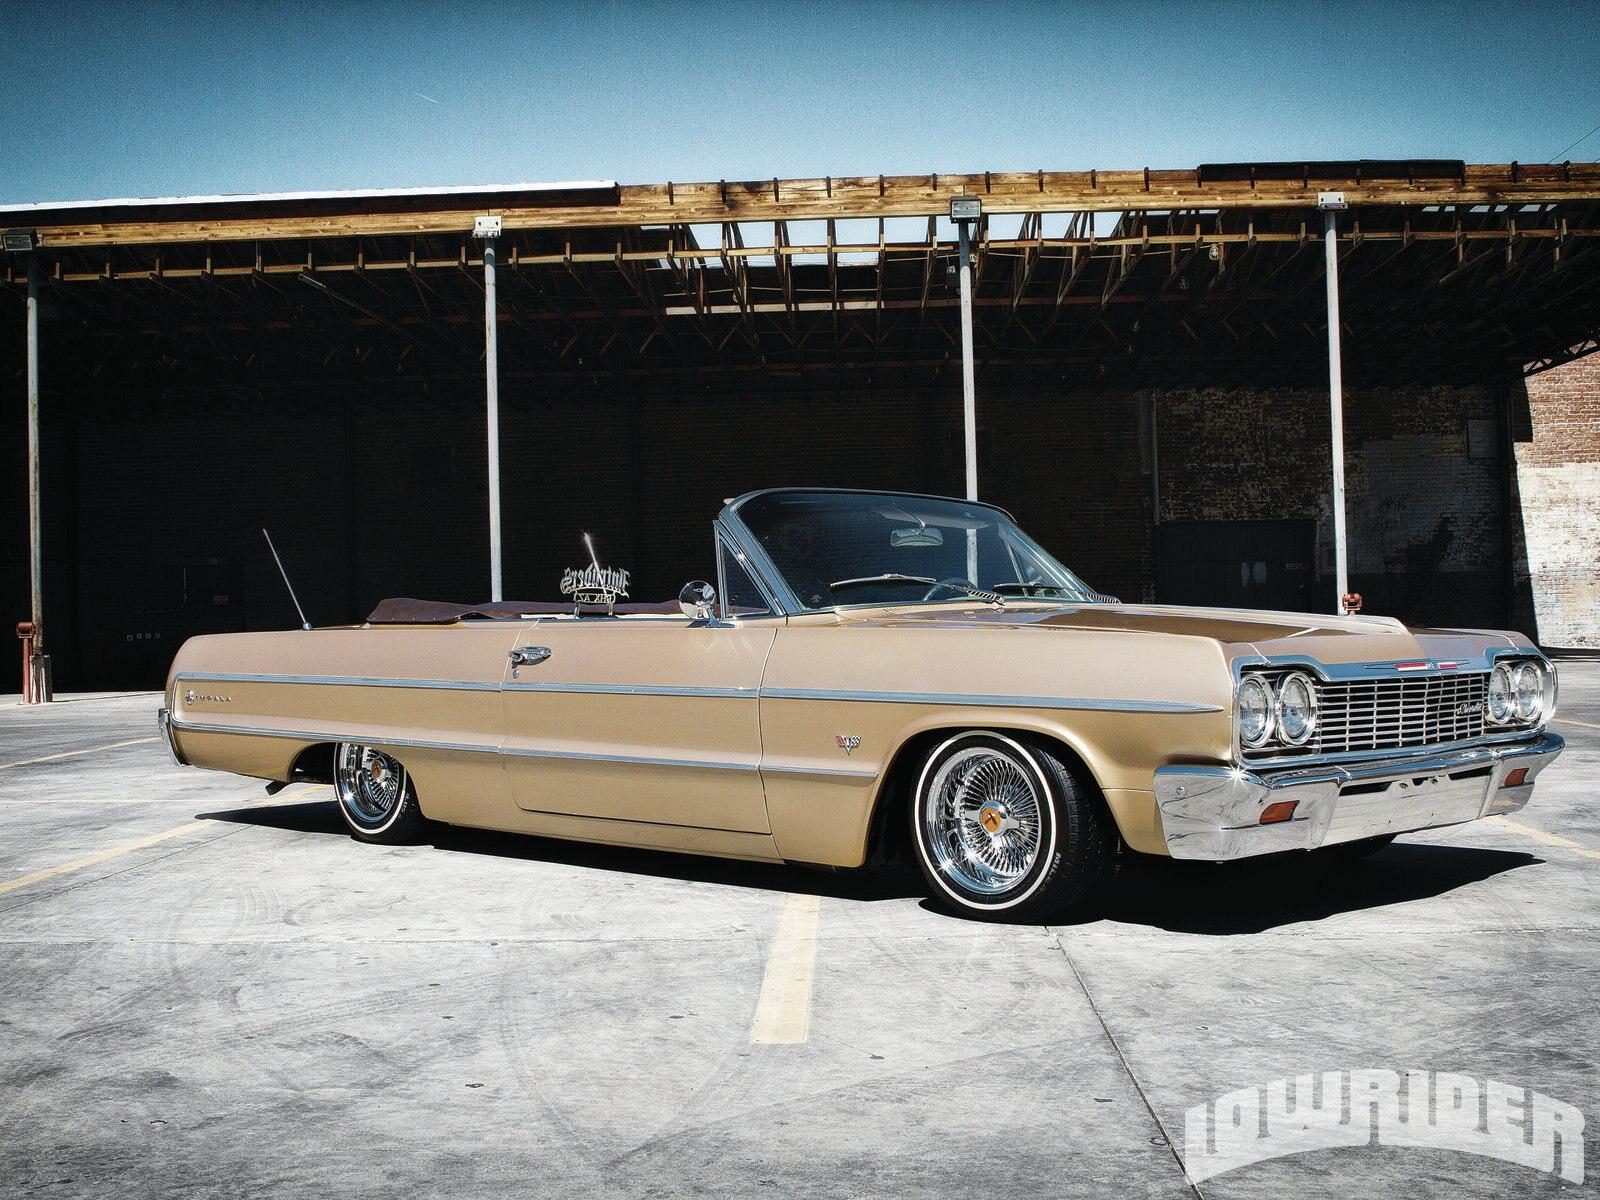 Police Officer Wallpaper Hd 1964 Chevrolet Impala Lowrider Lowrider Magazine